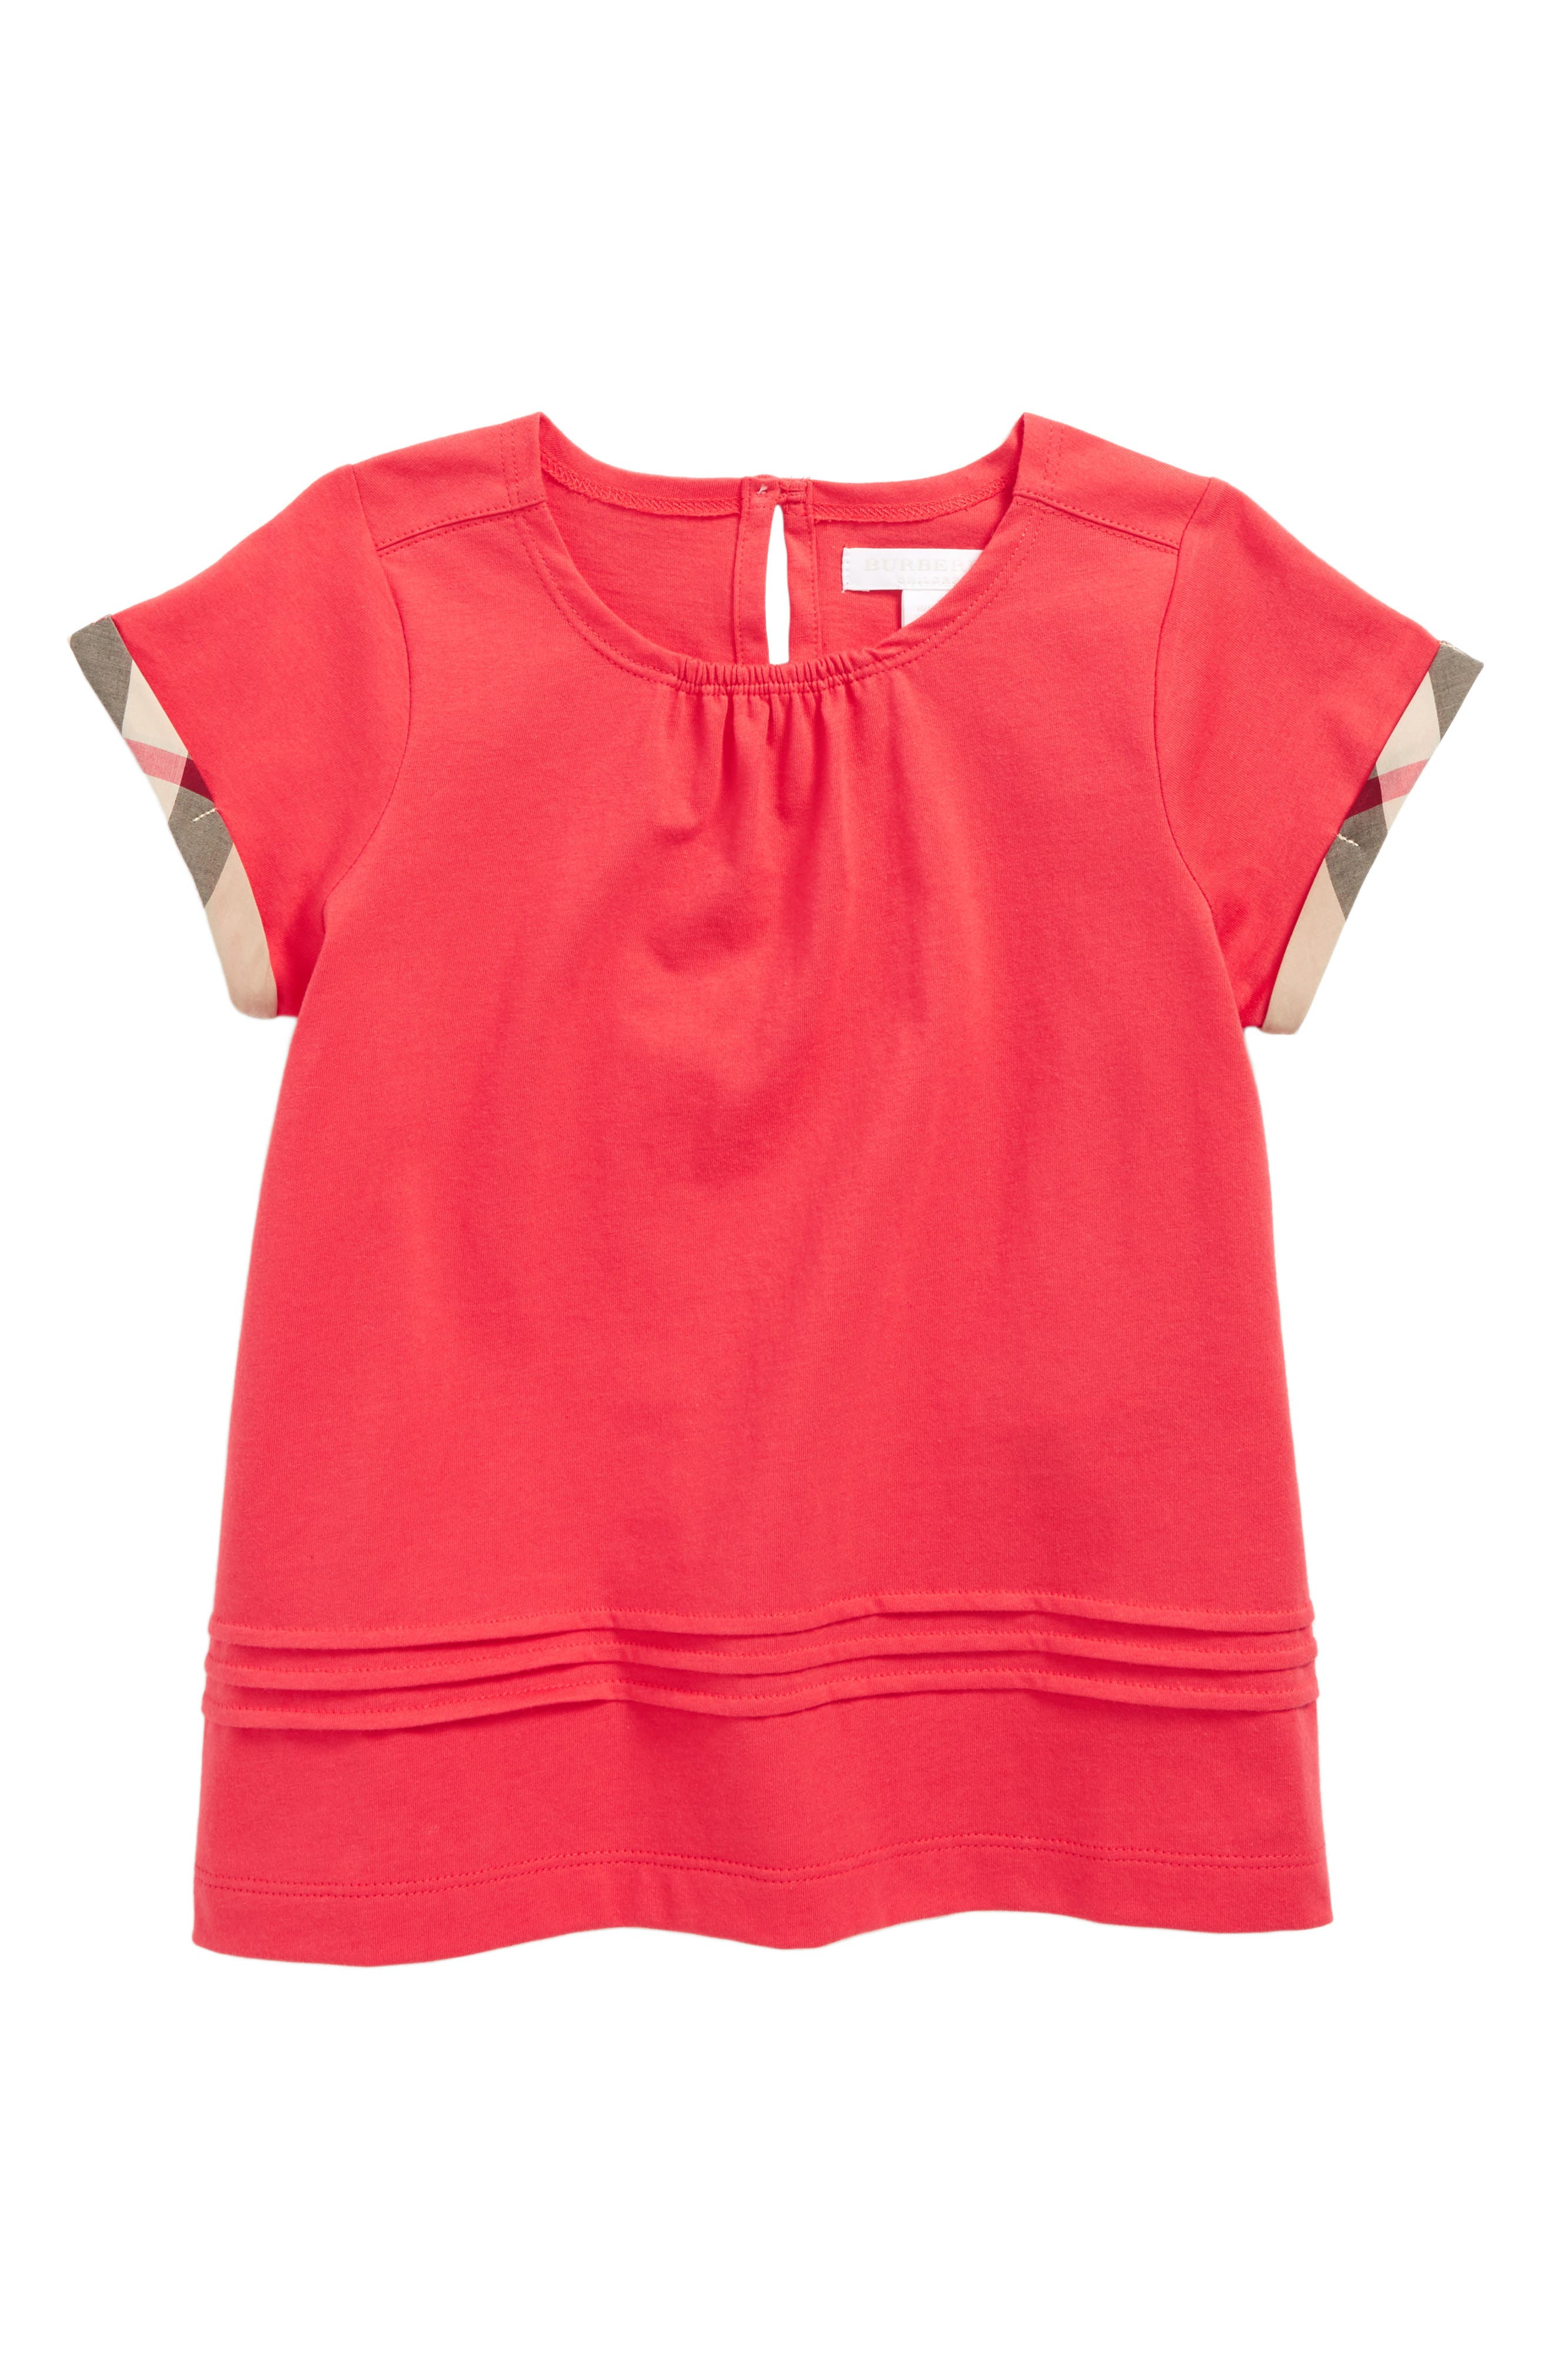 Burberry Gisselle Pleated Cuff Sleeve Tee (Baby Girls, Toddler Girls, Little Girls & Big Girls)